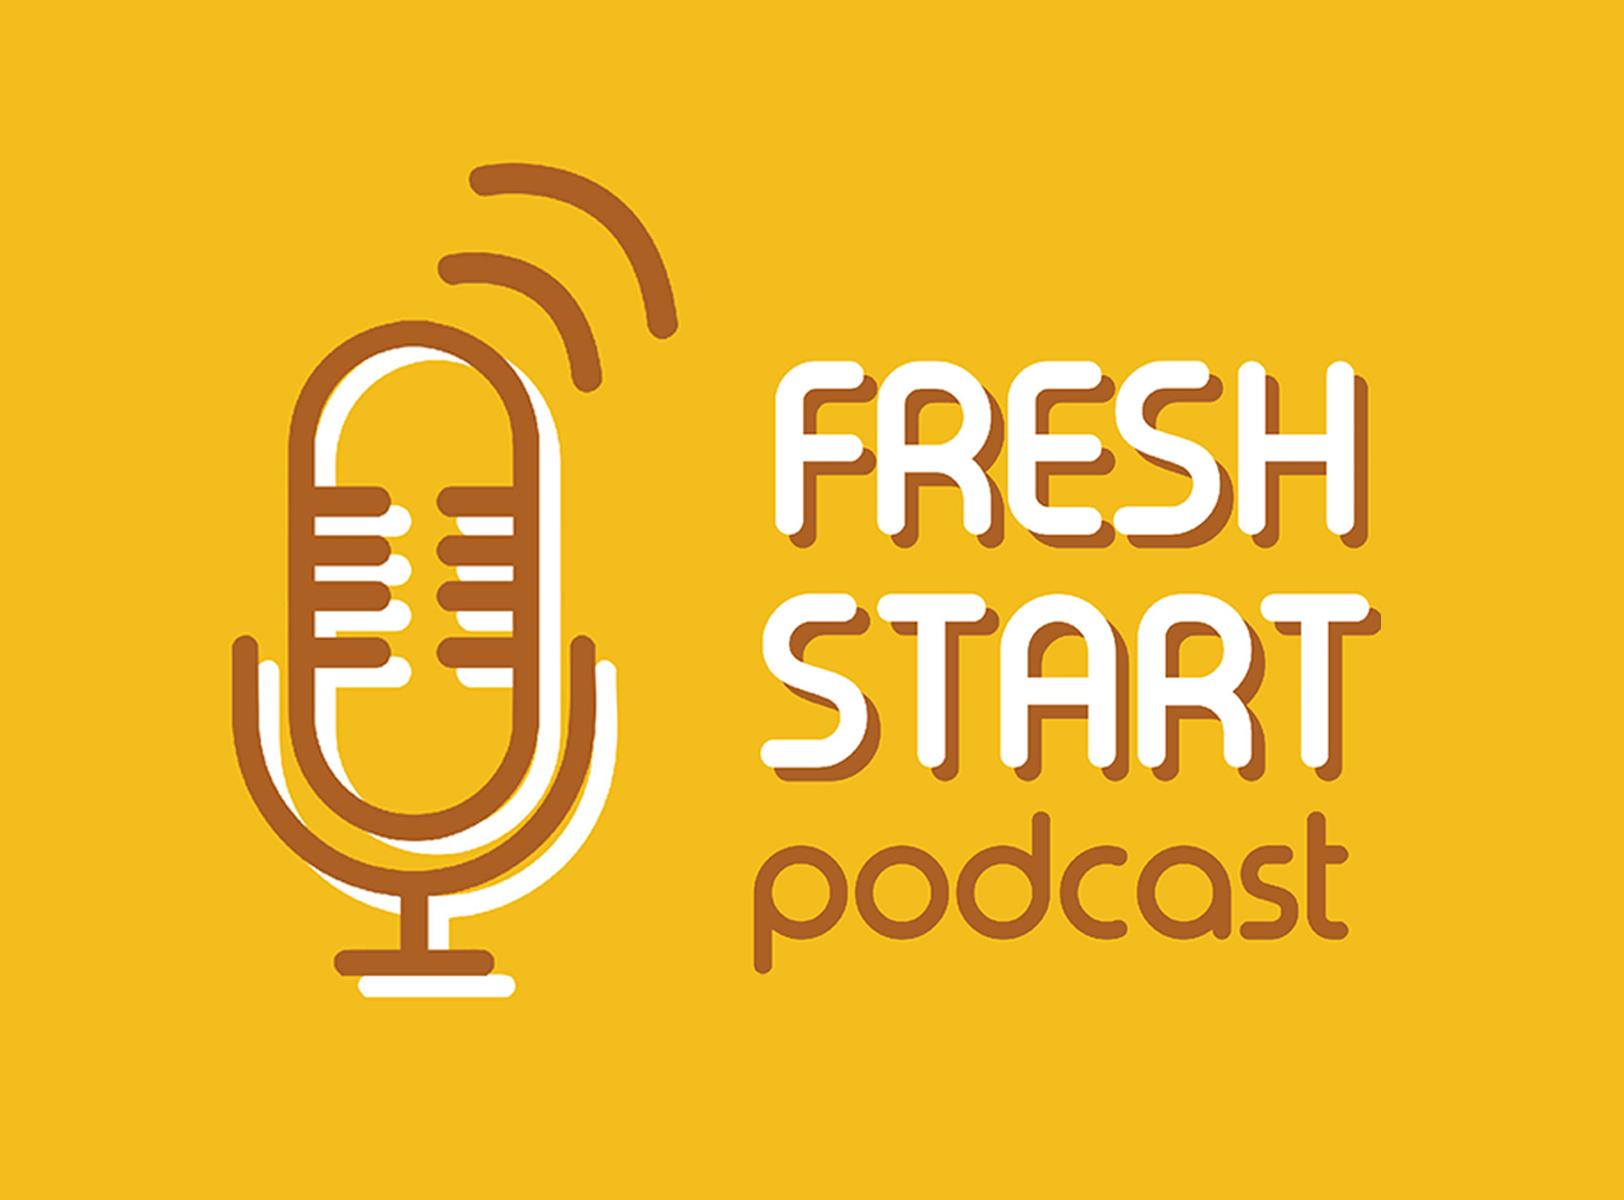 Fresh Start: Podcast News (11/1/2019 Fri.)